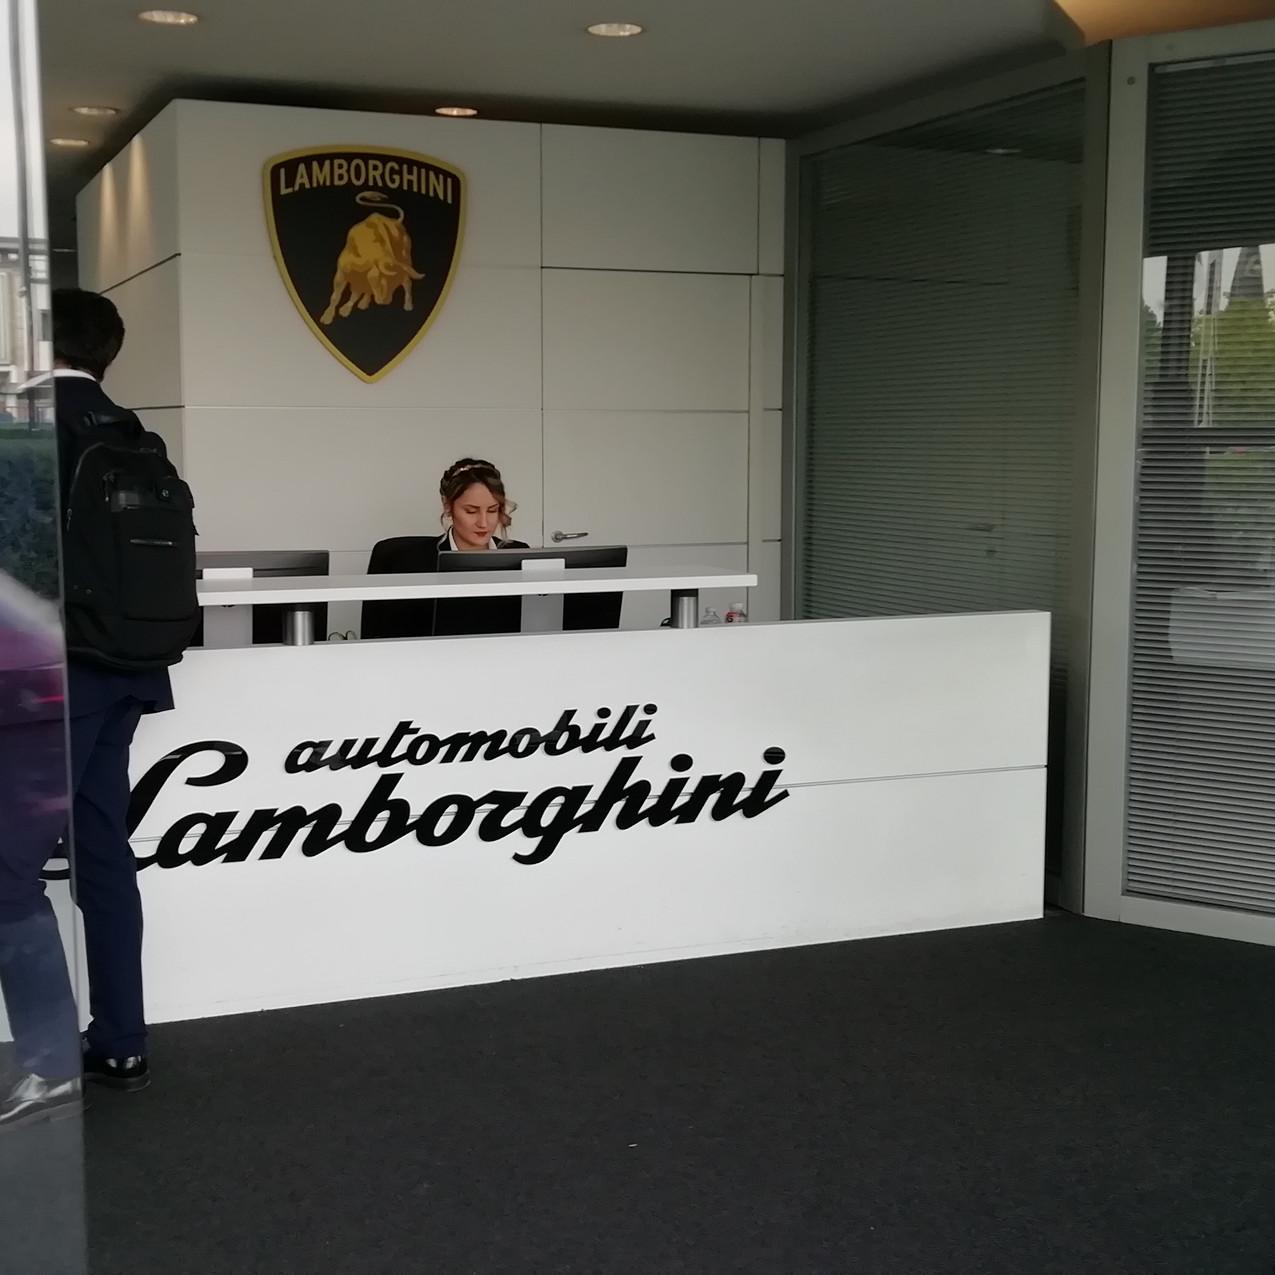 Recepcion Lamborghini